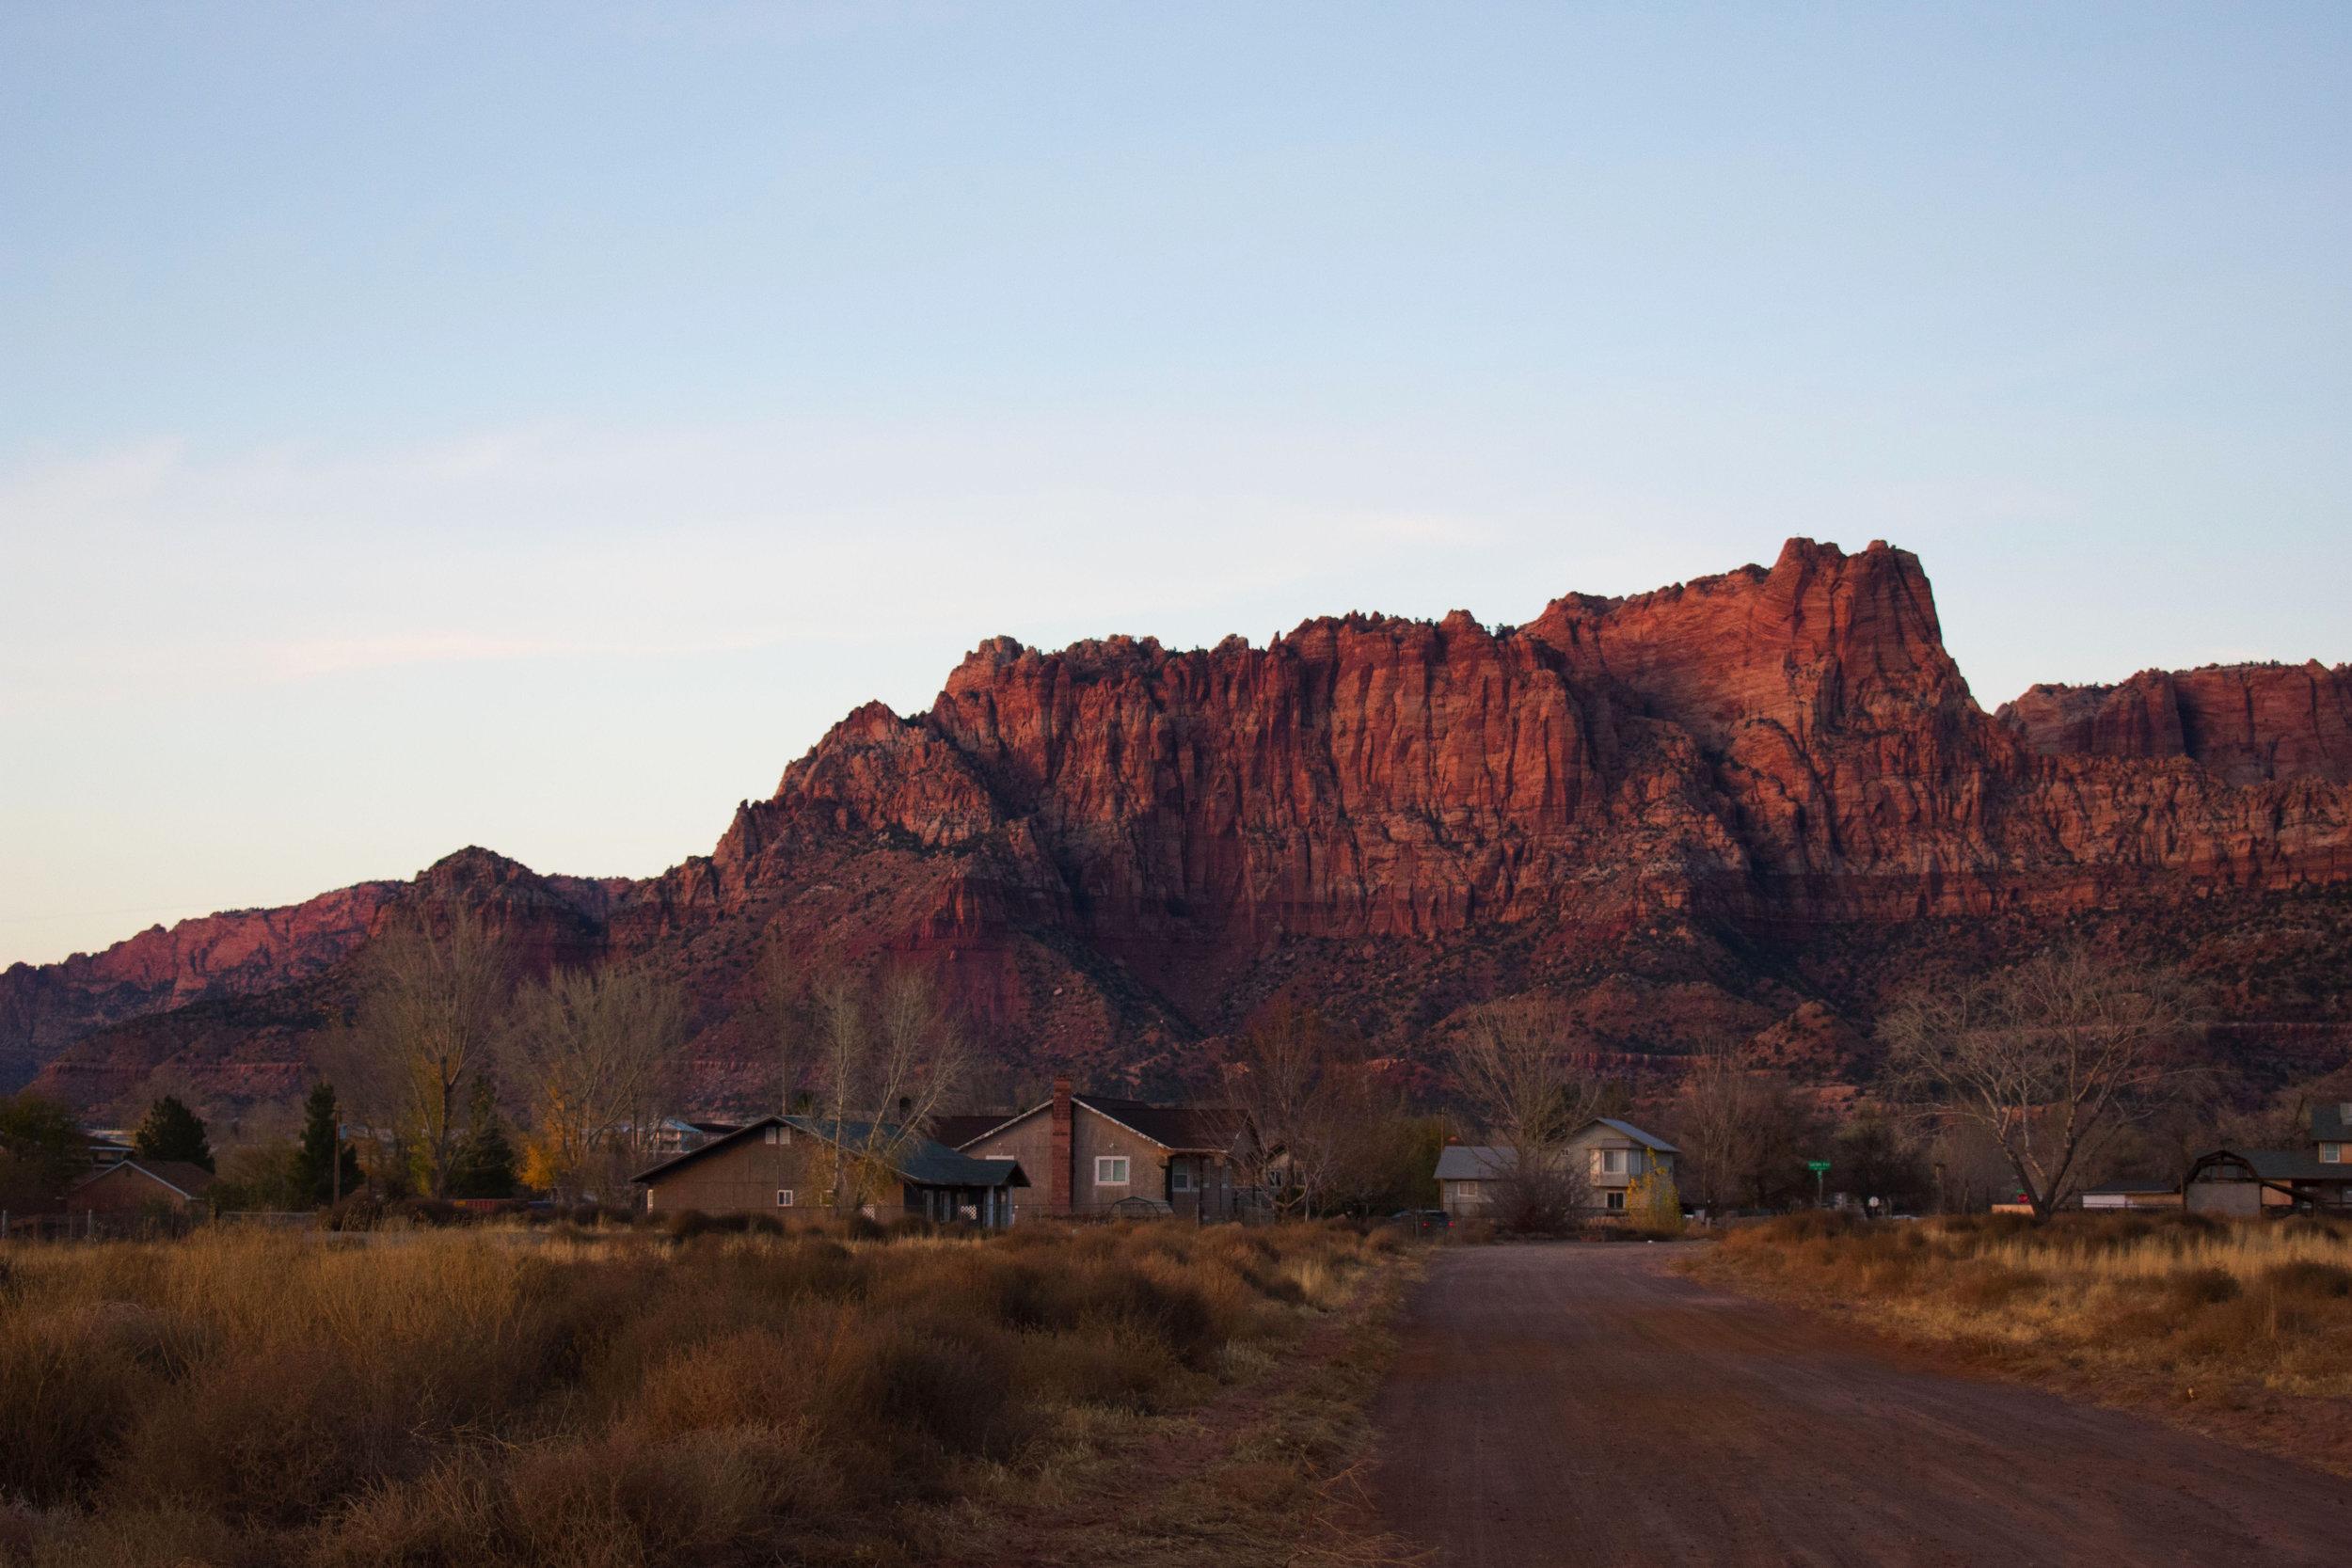 The vermillion cliffs of Short Creek at dusk.